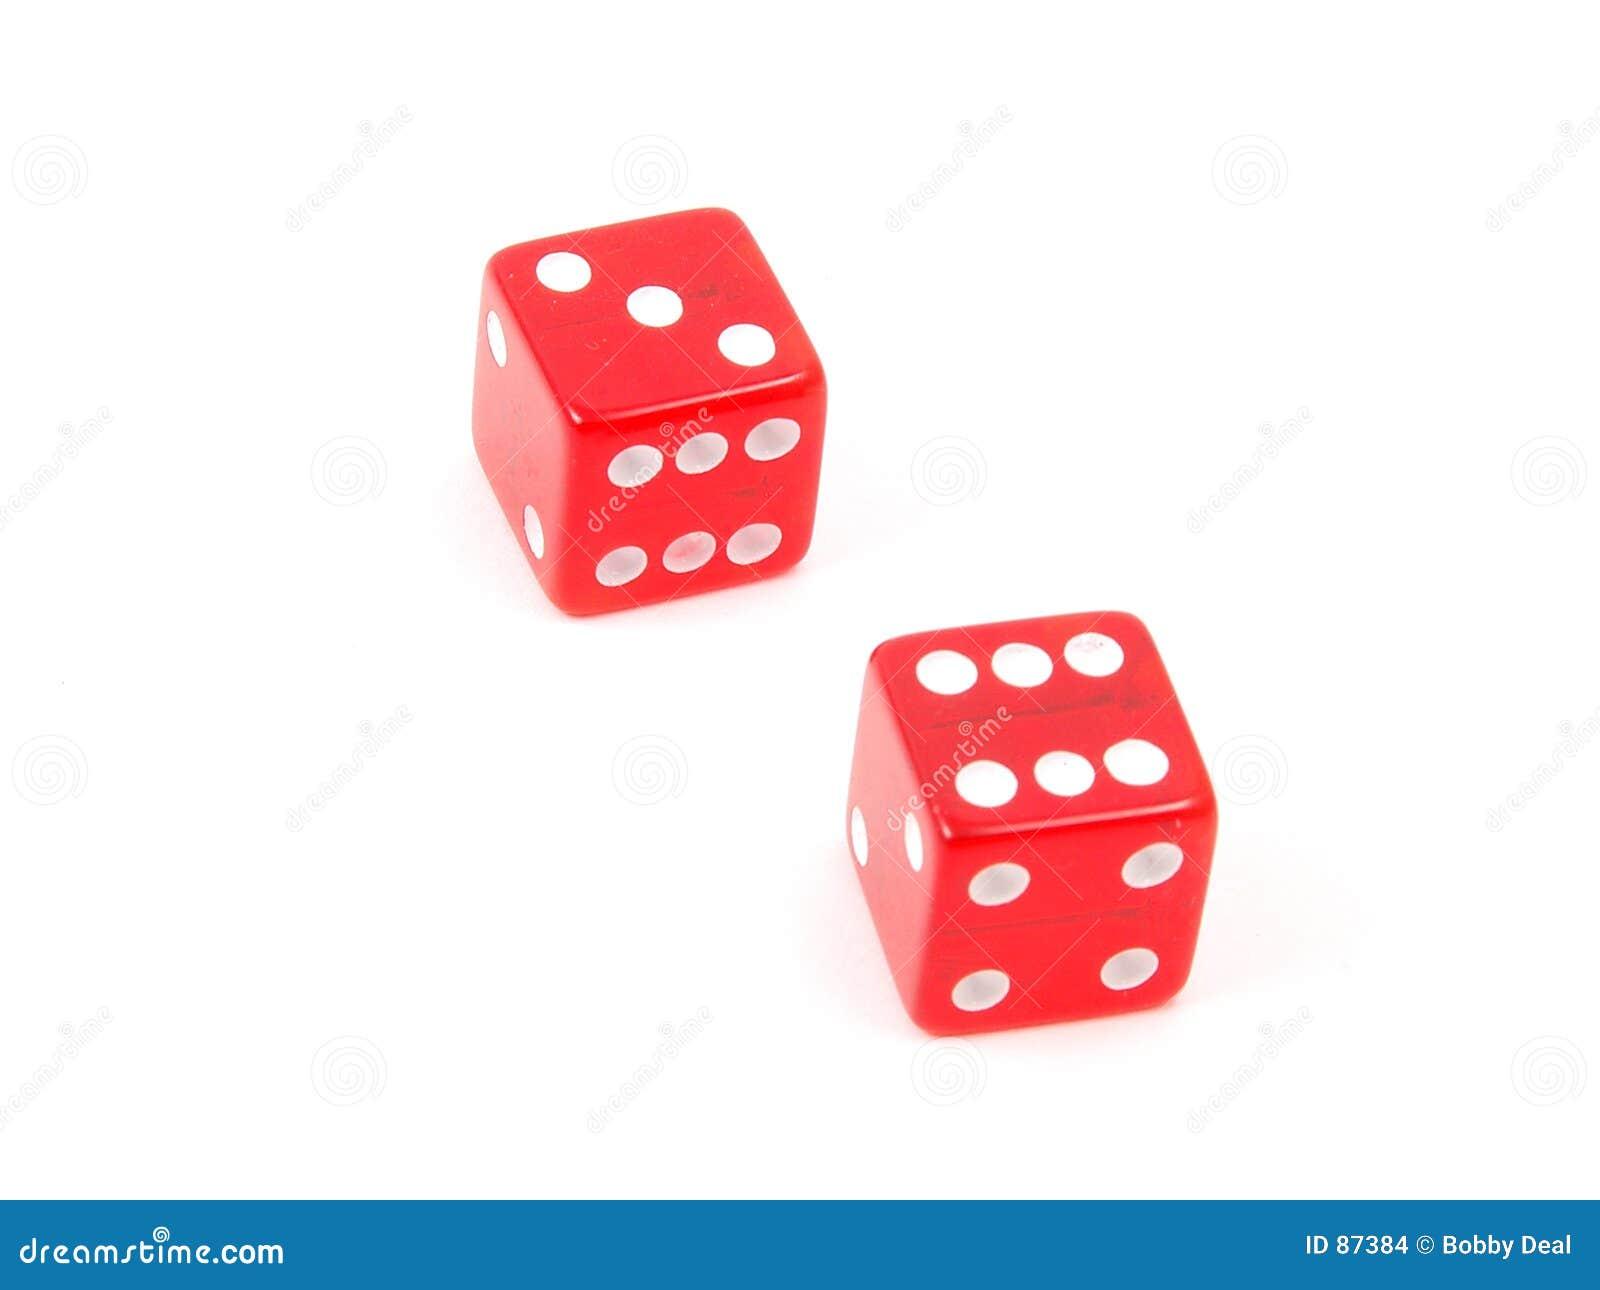 Hard way dice sets craps